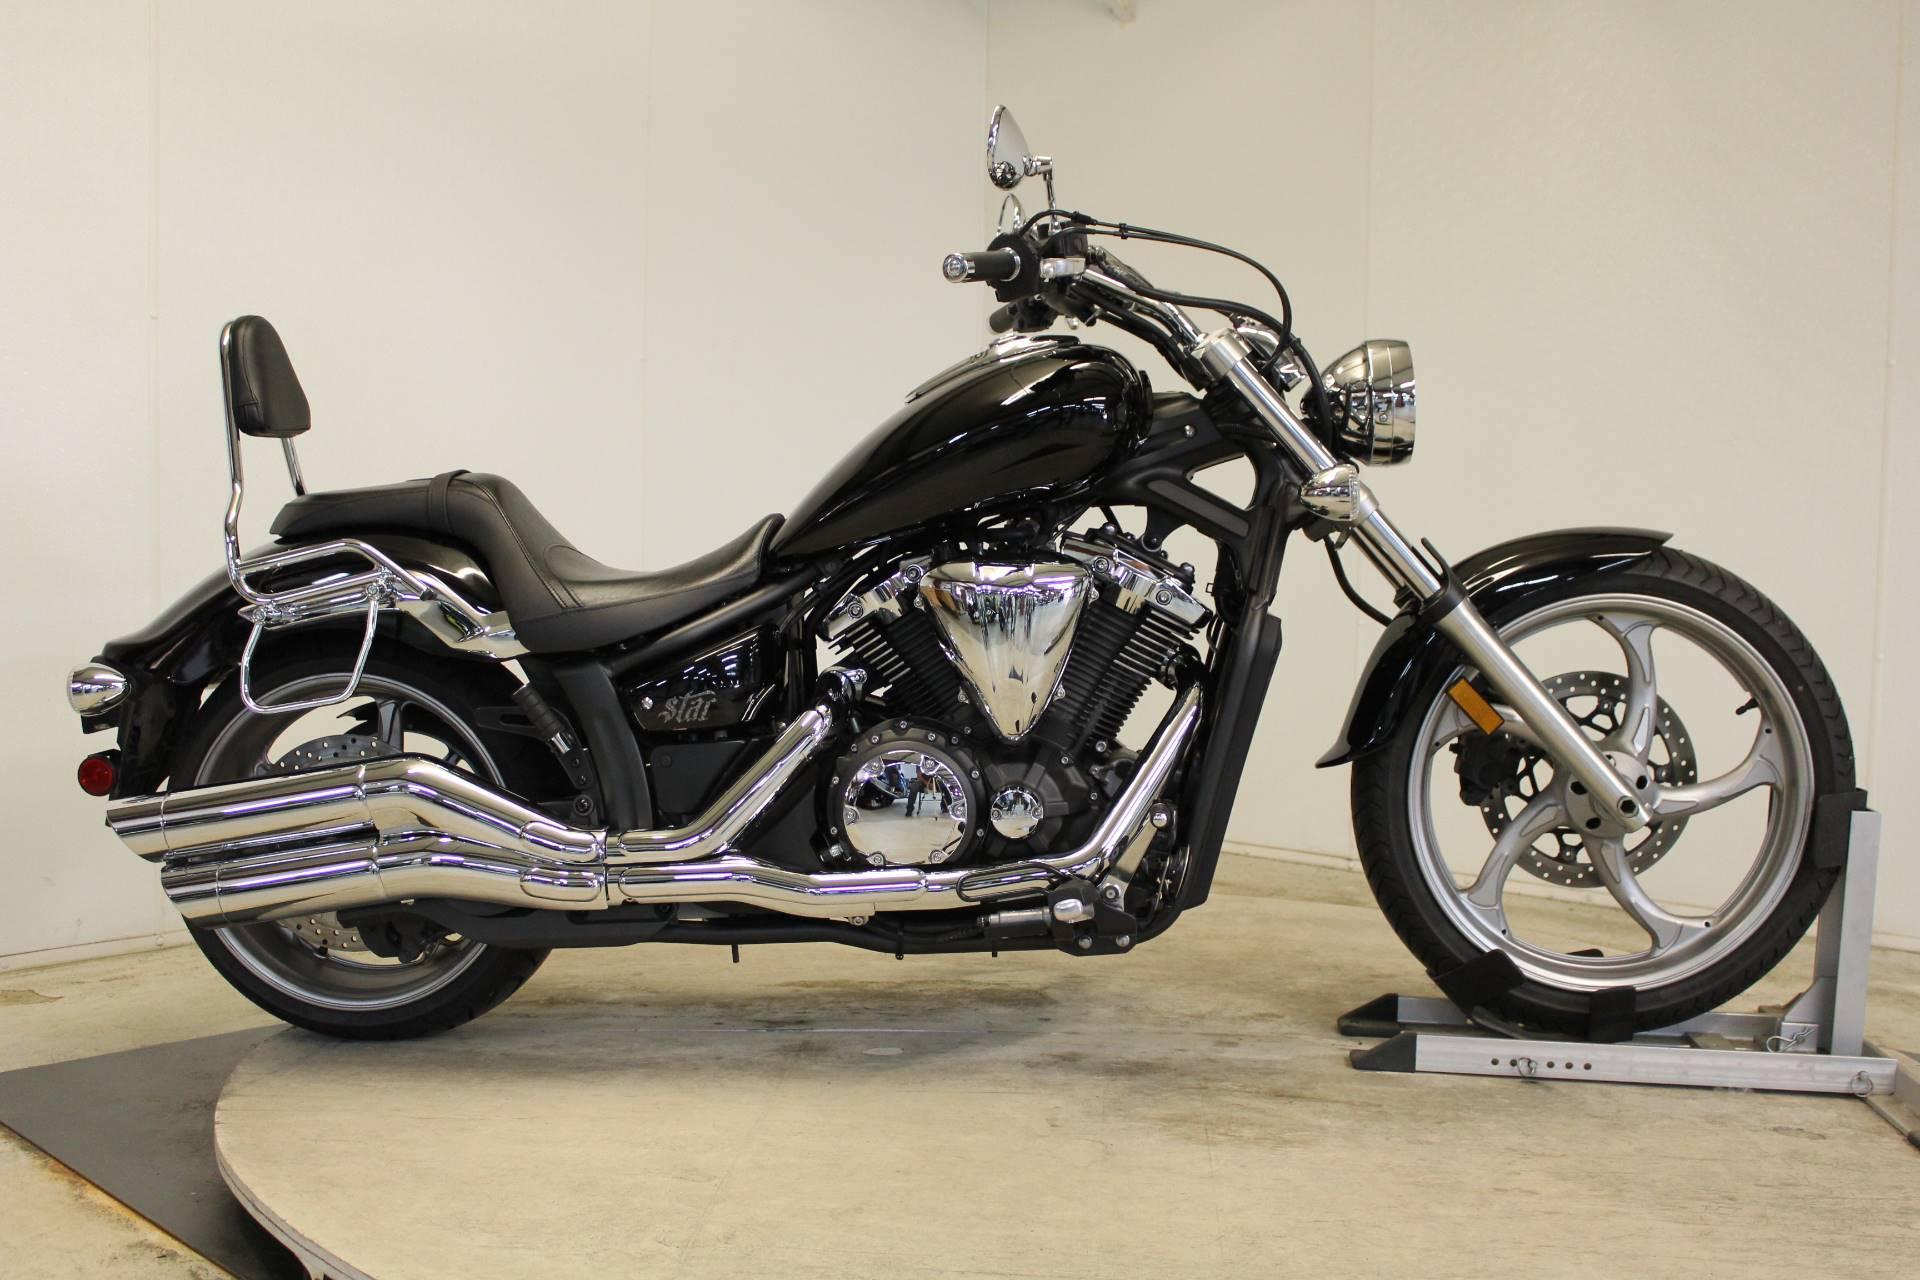 2012 Yamaha Stryker for sale 235548